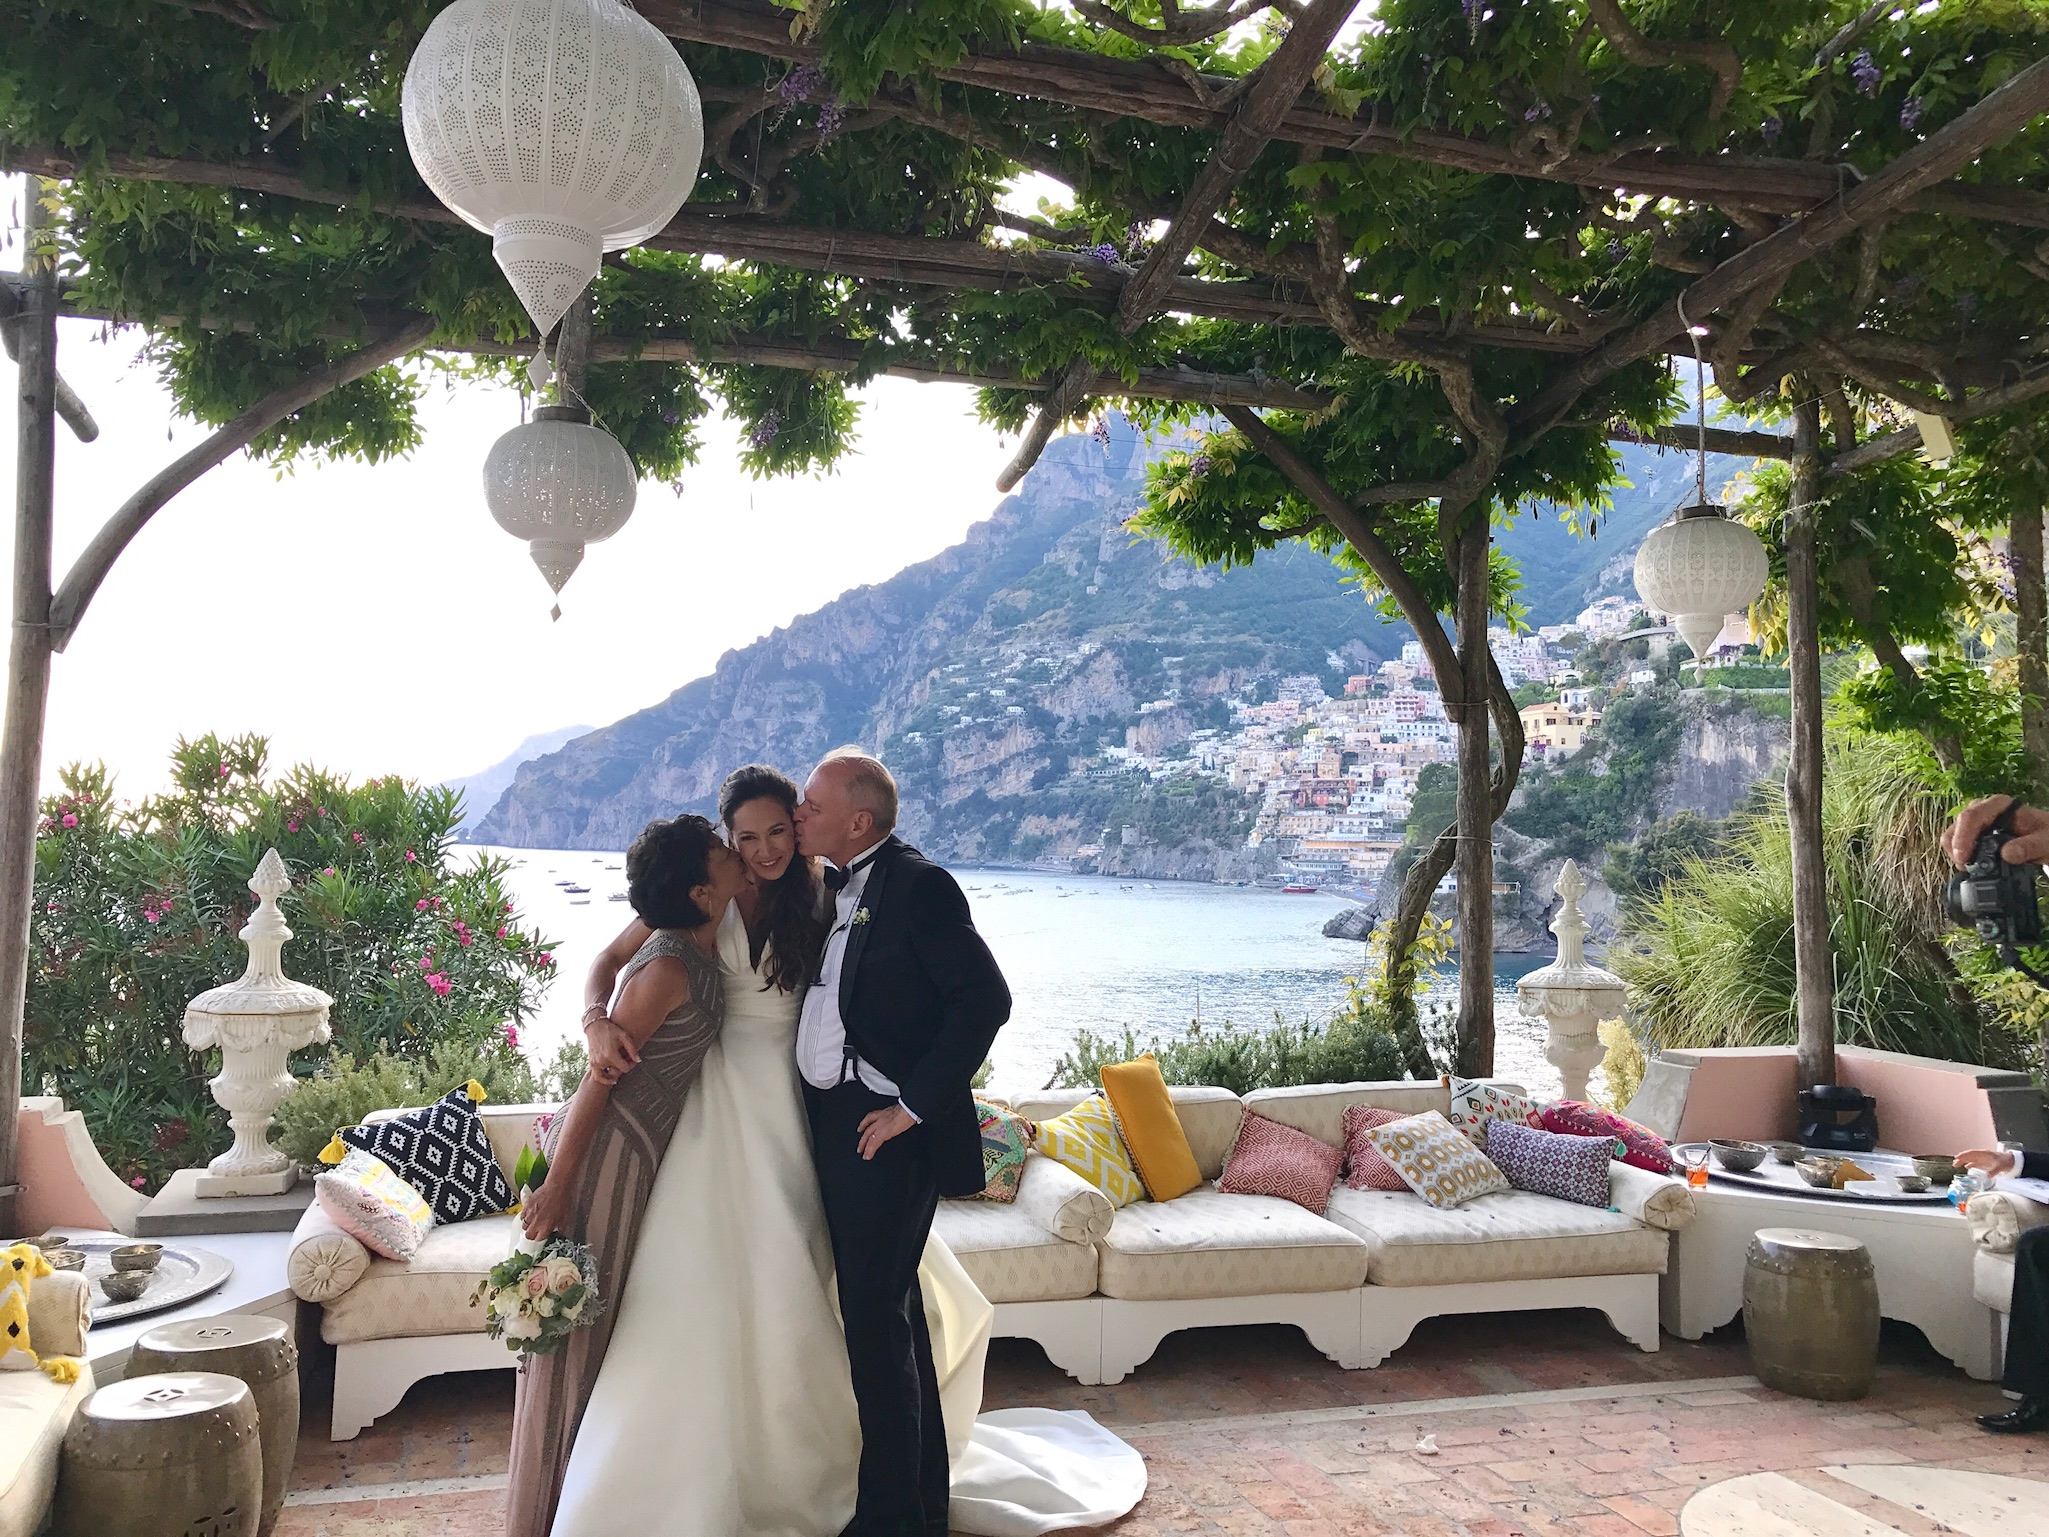 https://www.weddingamalfi.com/wp-content/uploads/Nathalie-and-Benjamin-Wedding-in-Positano-Italy-10.jpg